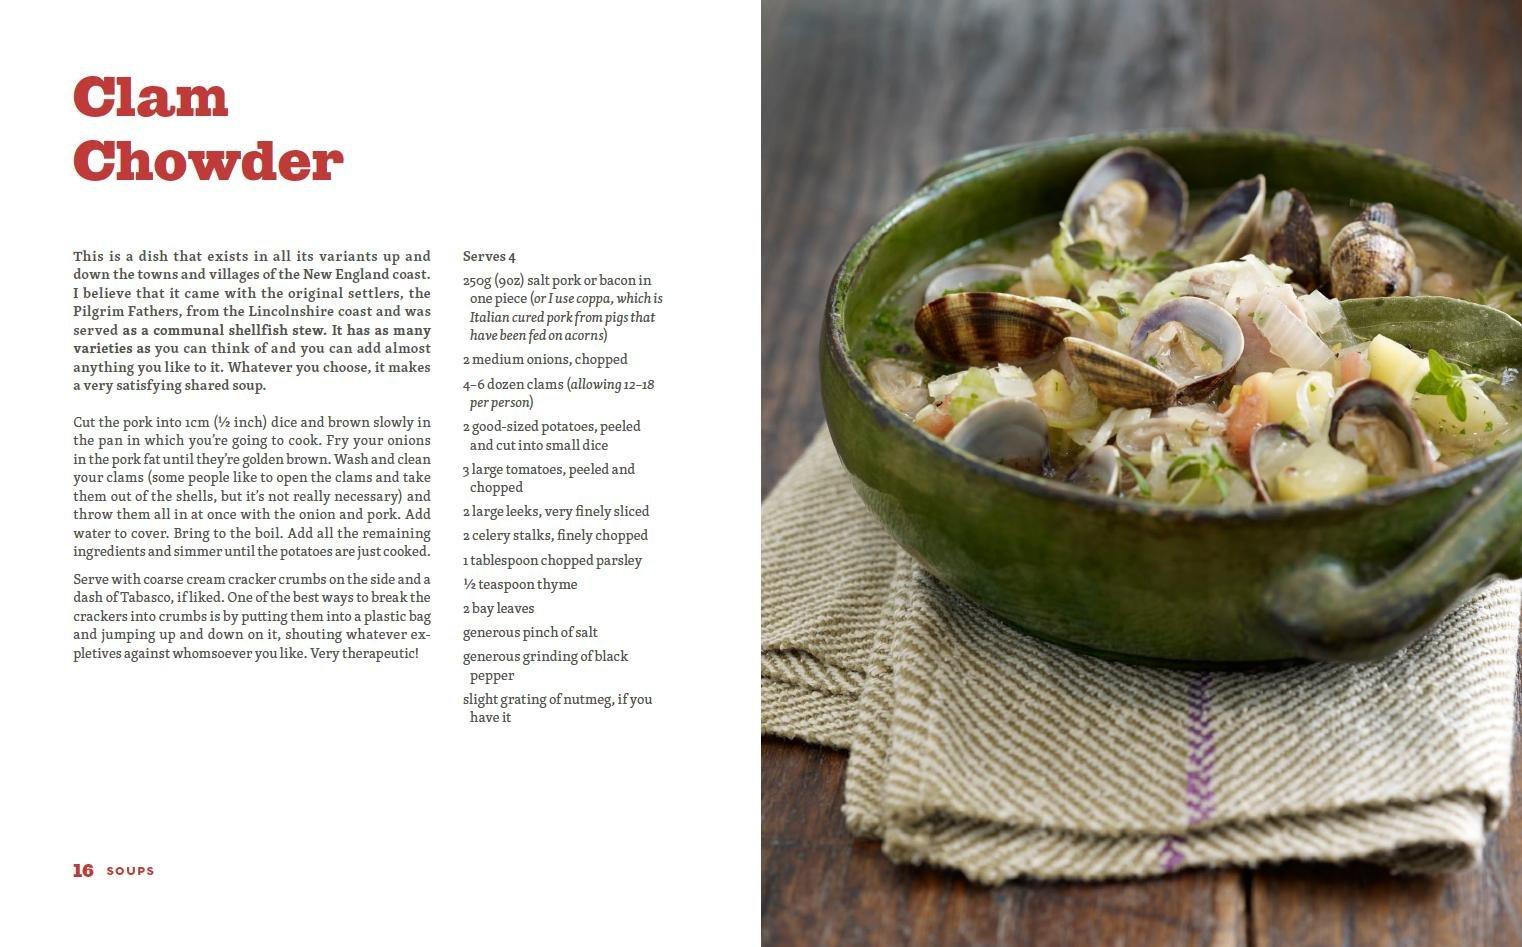 Clarissa's One Pot Cookbook: Amazon: Clarissa Dickson Wright:  9780340998526: Books